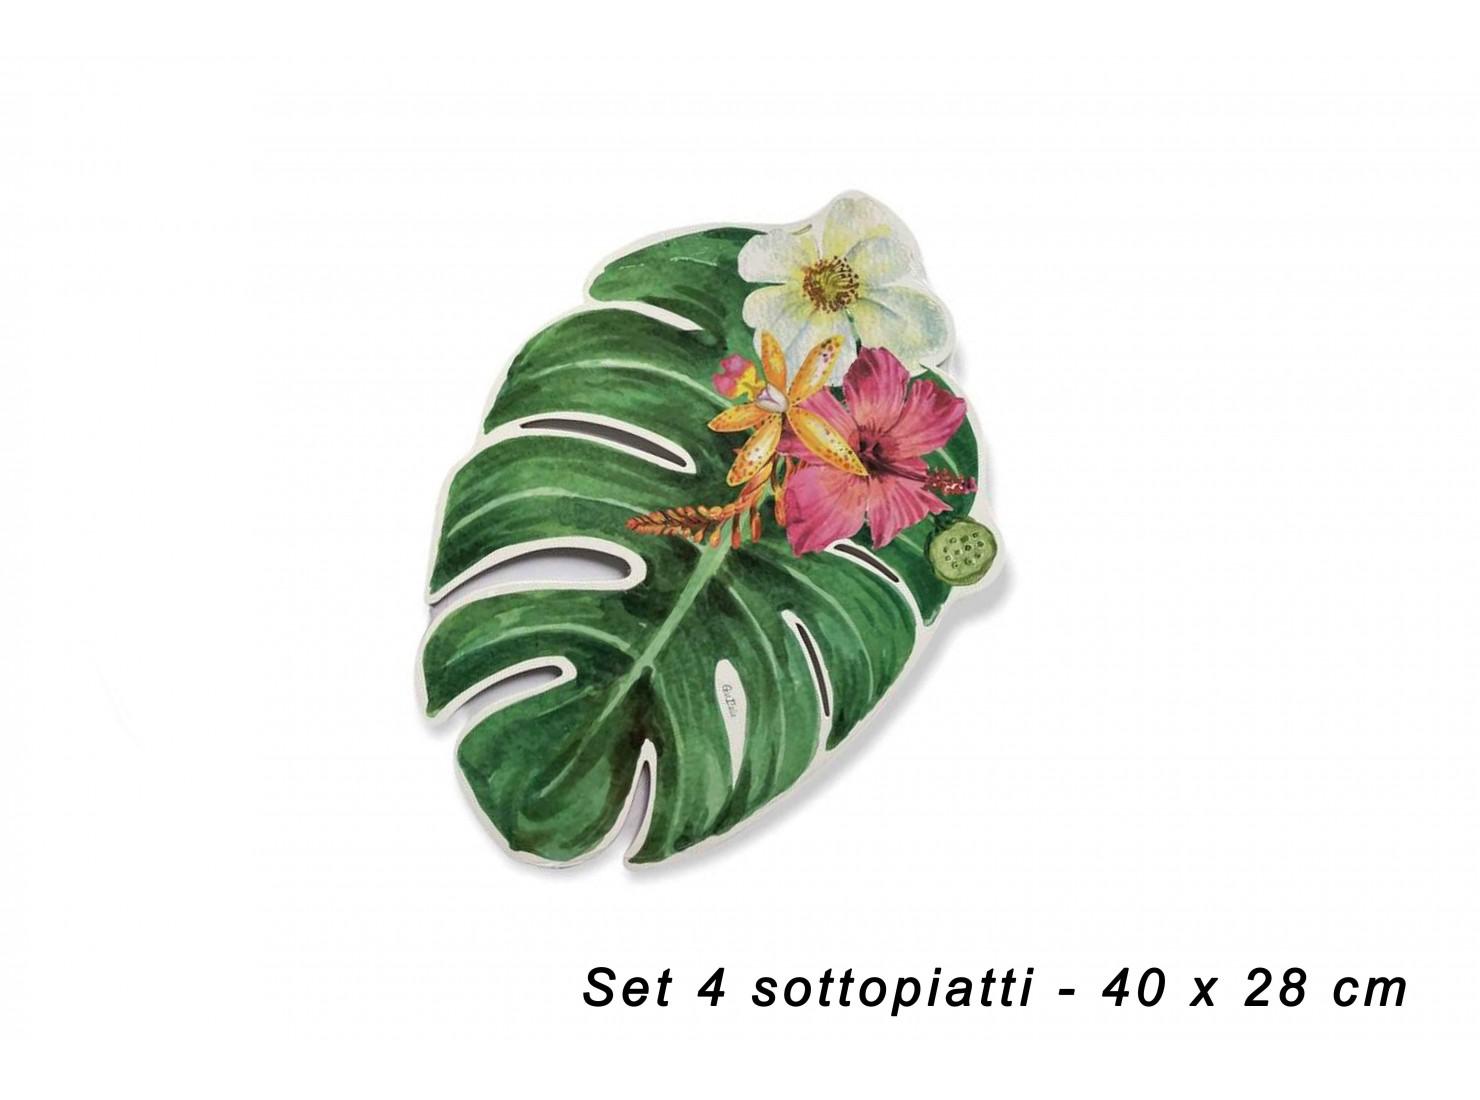 SET 4 SOTTOPIATTI - 40 X 28...